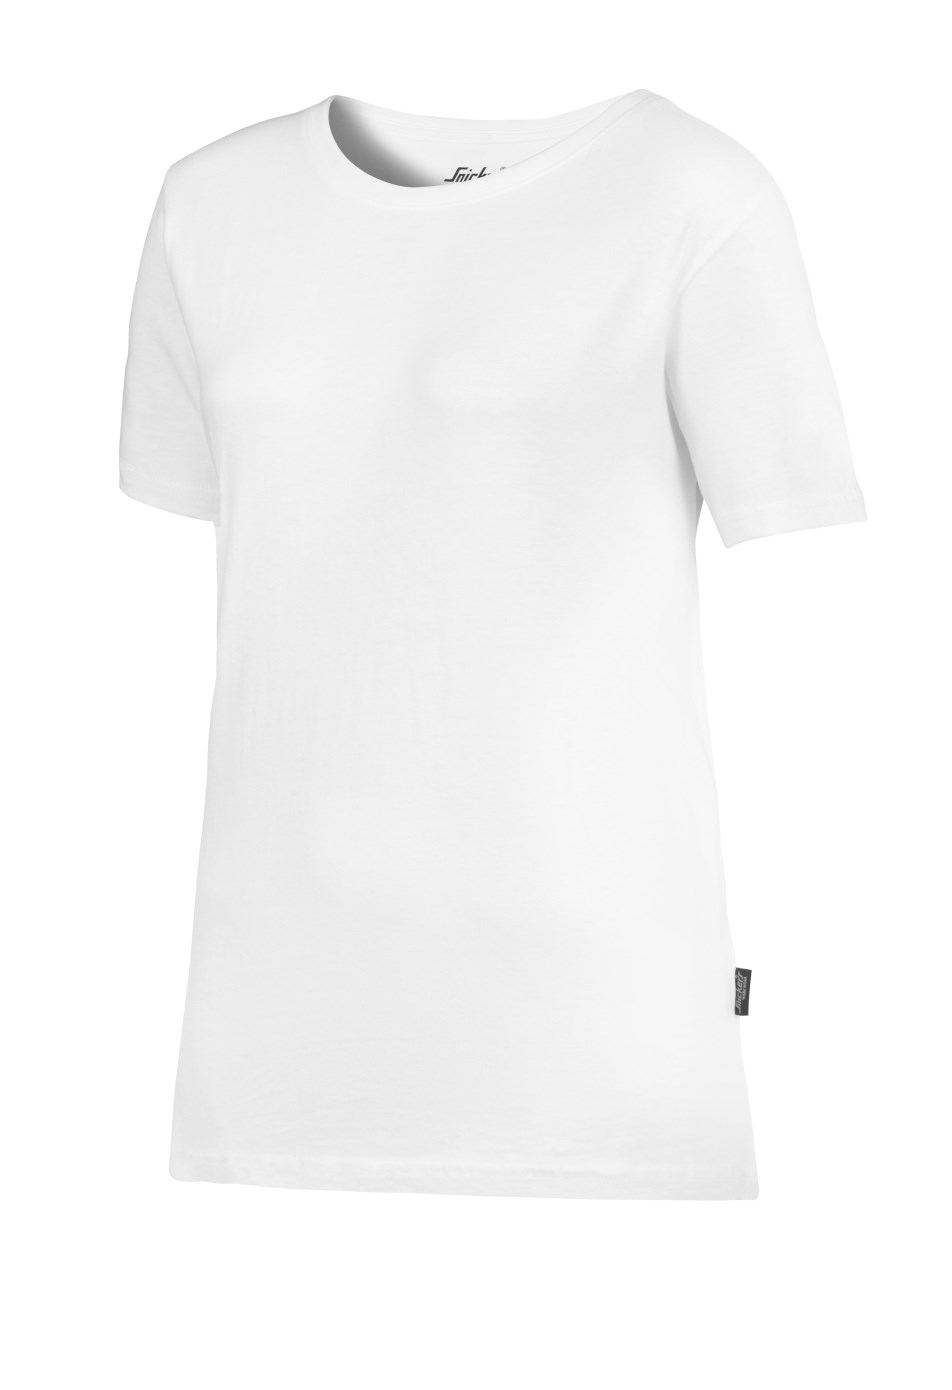 T skjorte dame Snickers Workwear 2516 ~100% kammet bomull